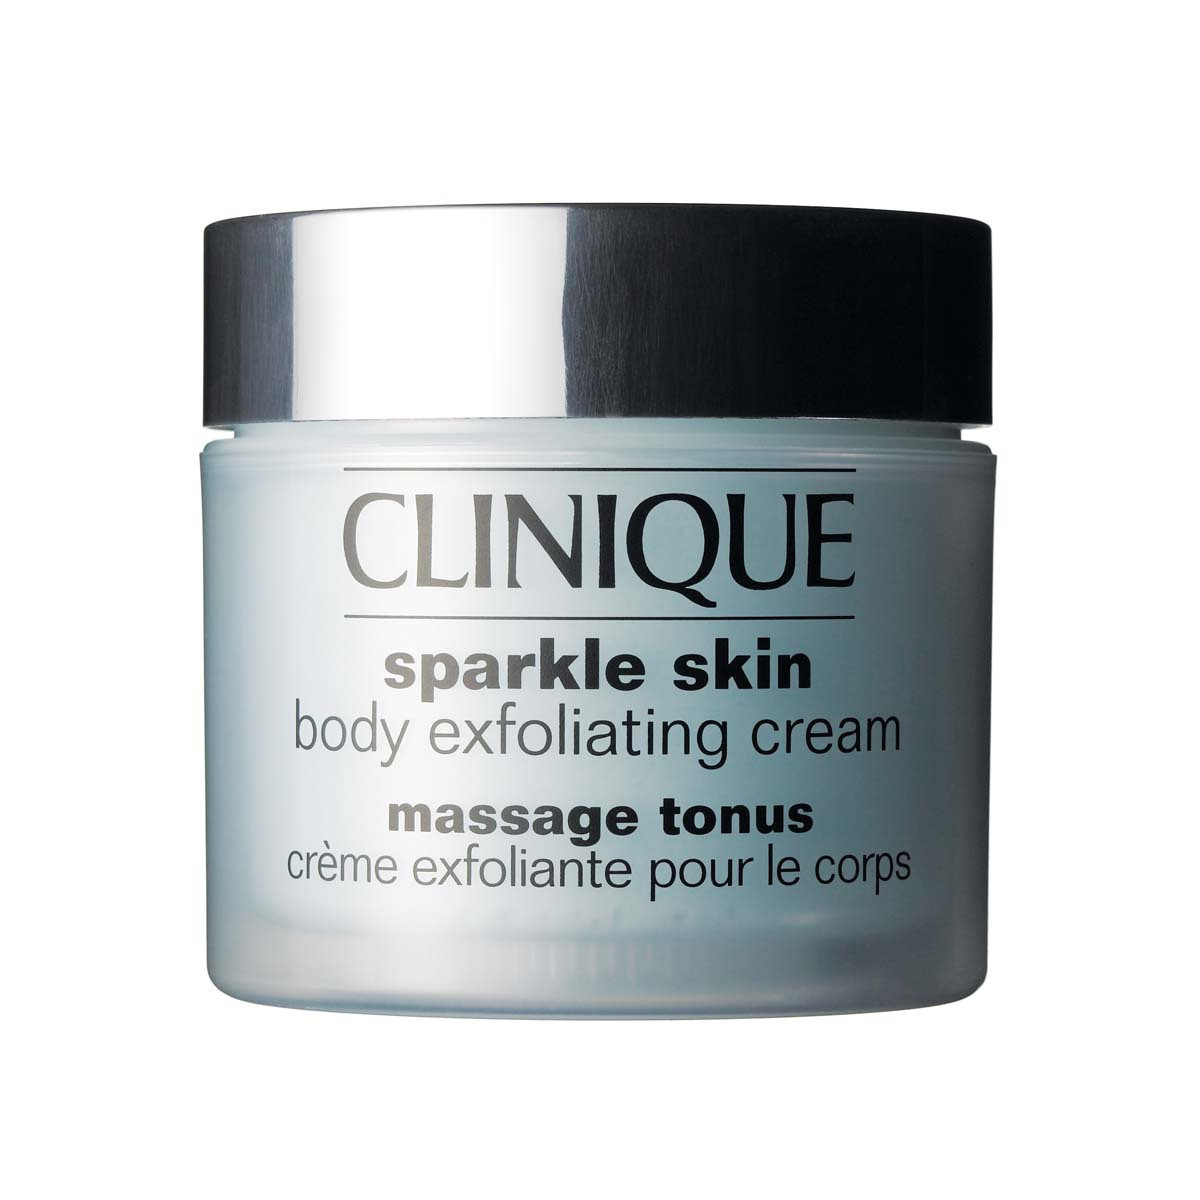 Clinique sparkle skin body exfoliating cream 250 ml, Azzurro, large image number 0